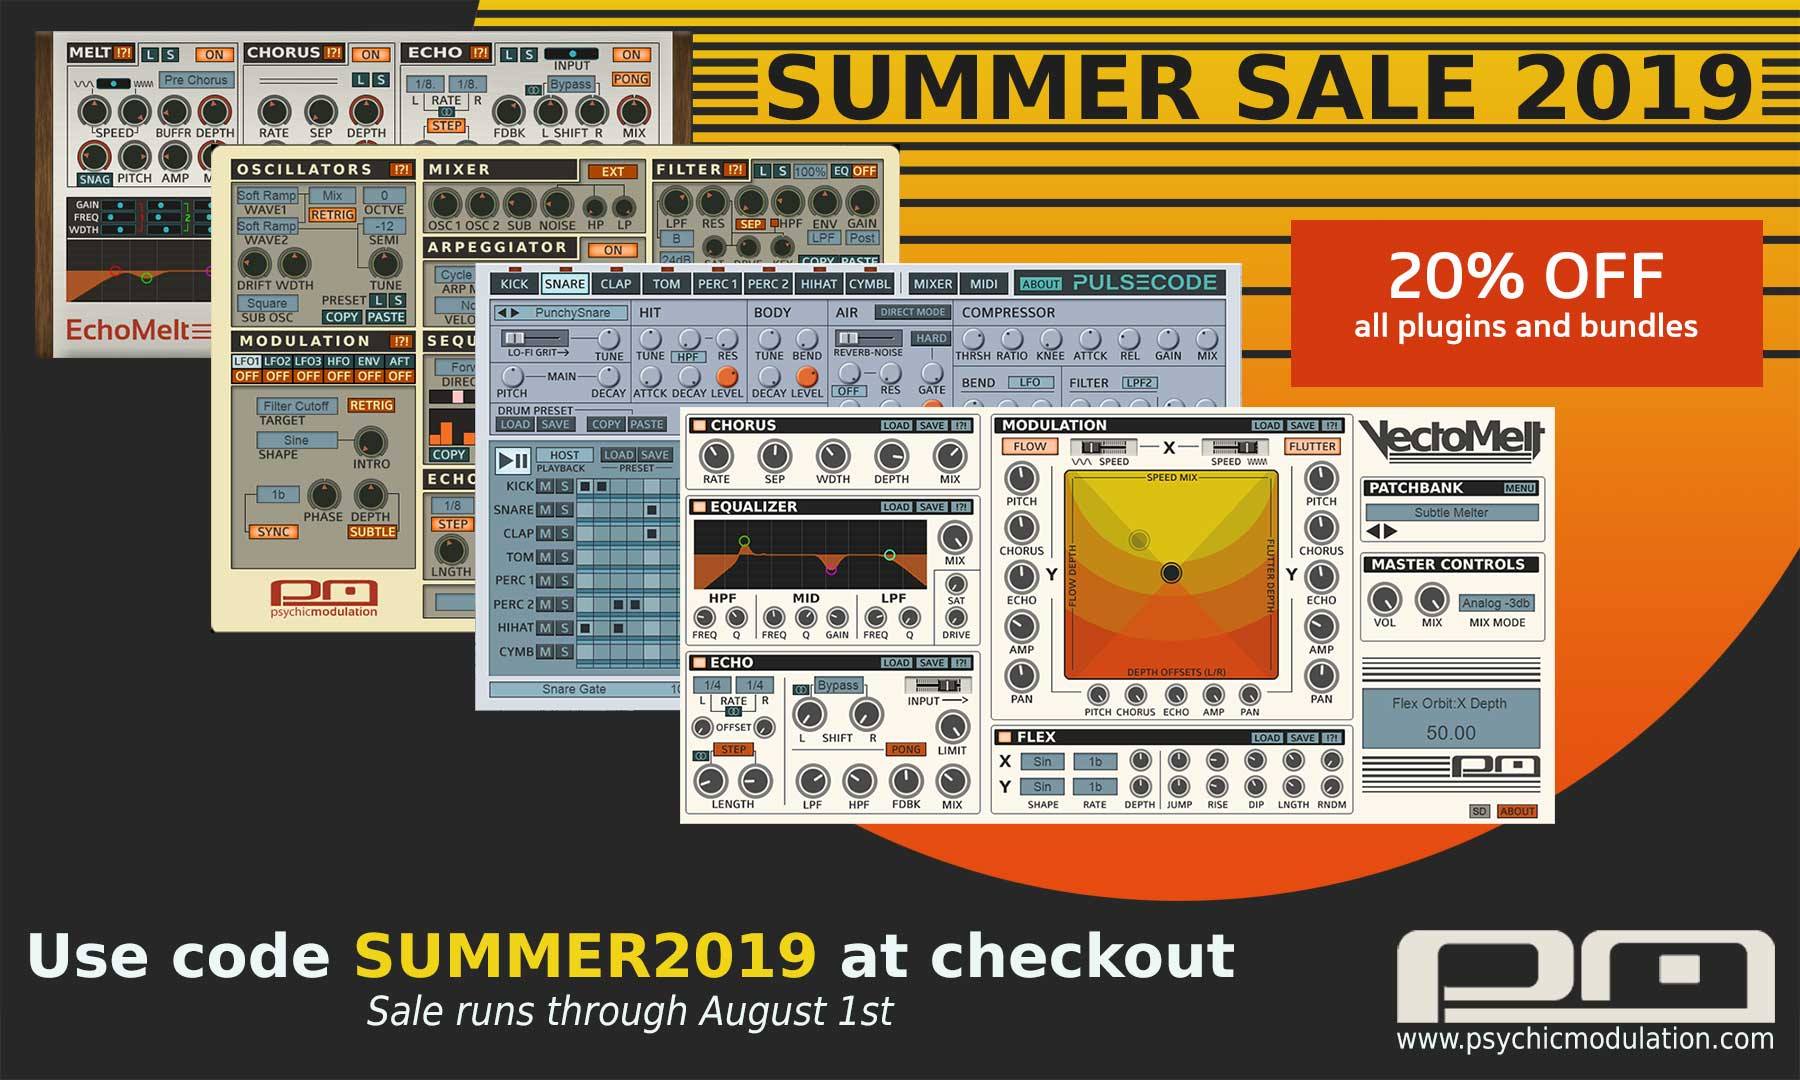 KVR: #KVRDeal Psychic Modulation Summer Sale: 20% off all plugins